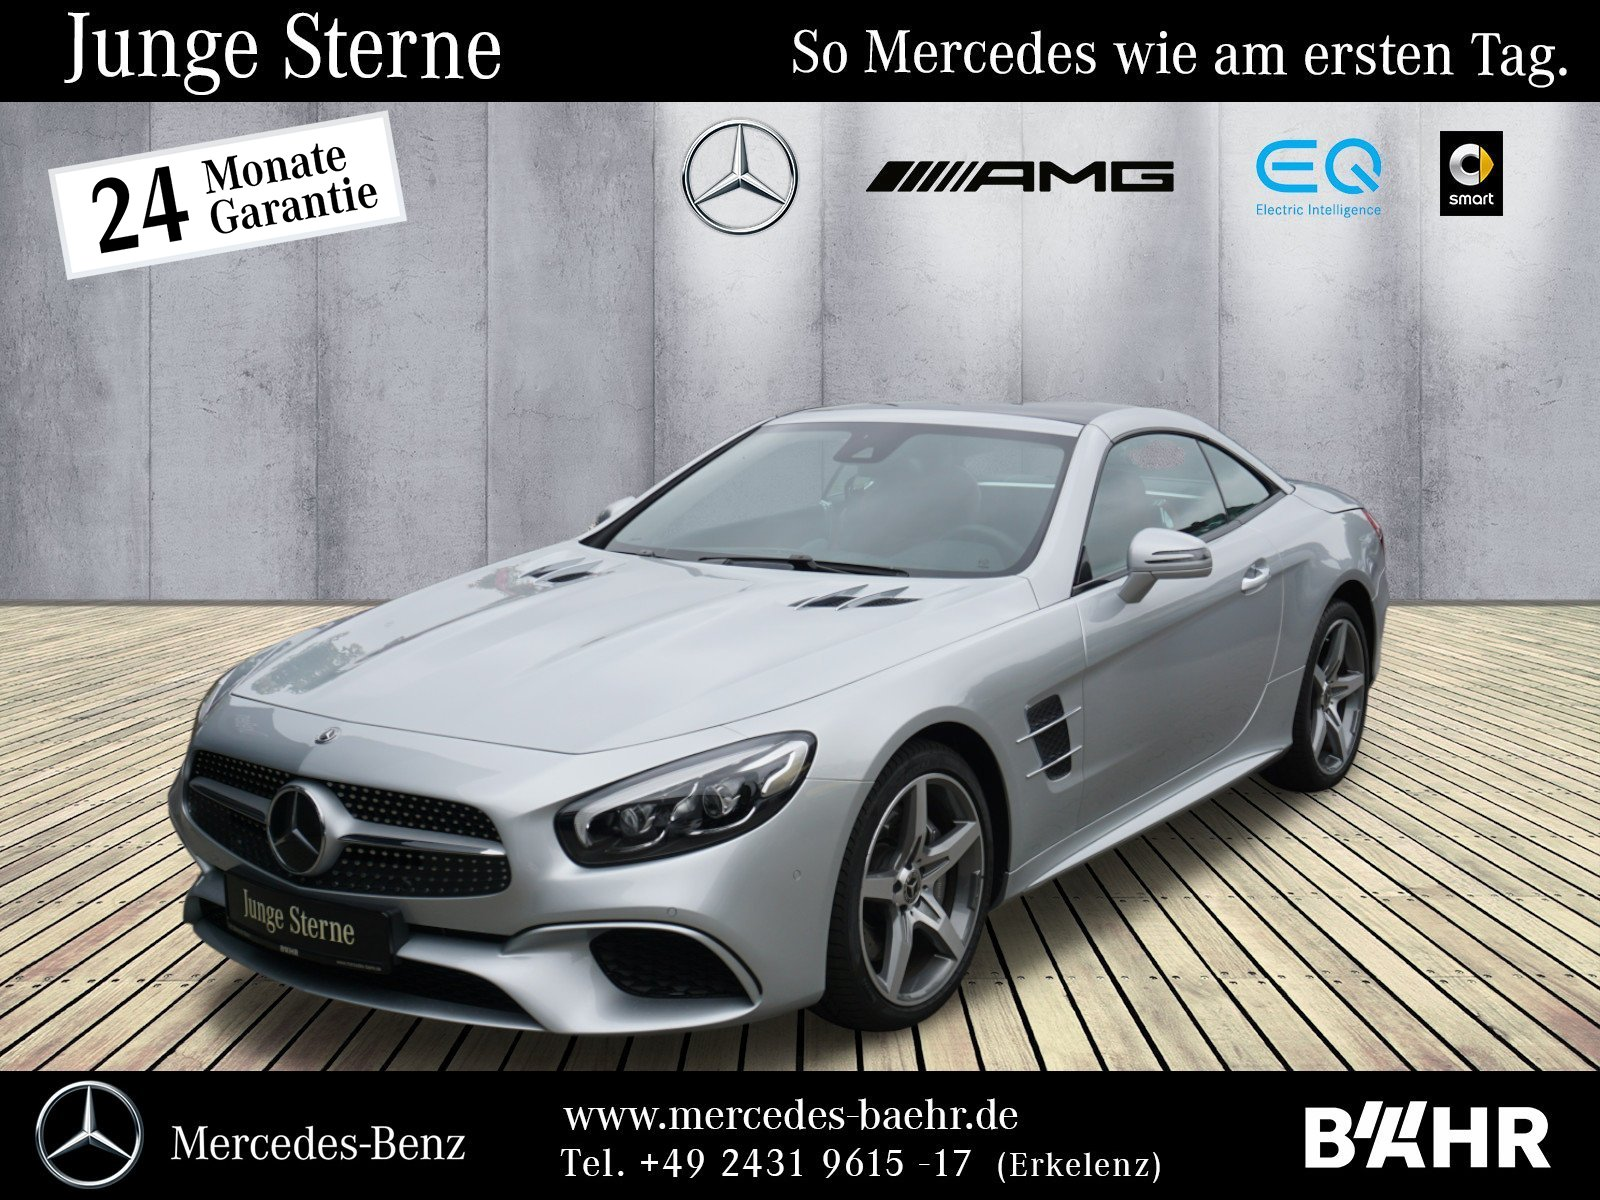 Mercedes-Benz SL 400 AMG/Comand/LED-ILS/Airscarf/HarmanKardon, Jahr 2016, Benzin